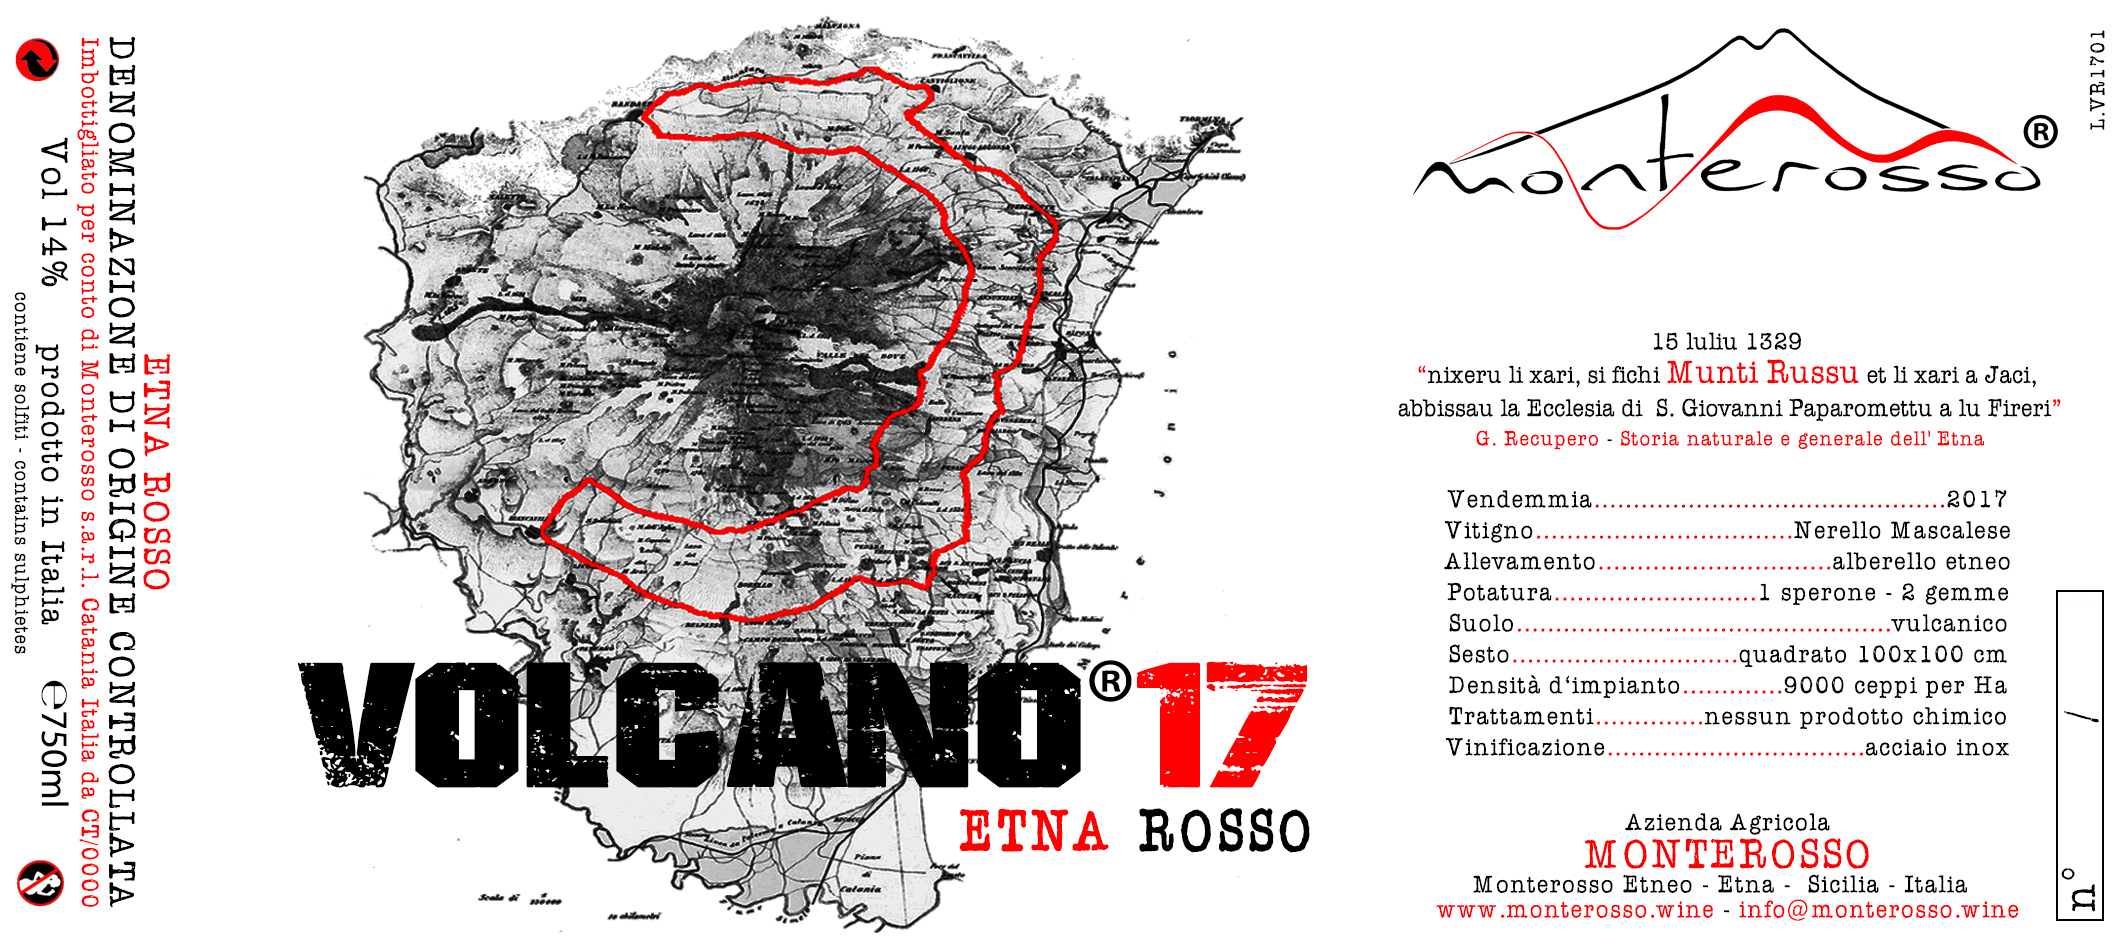 Volcano Rosso 17